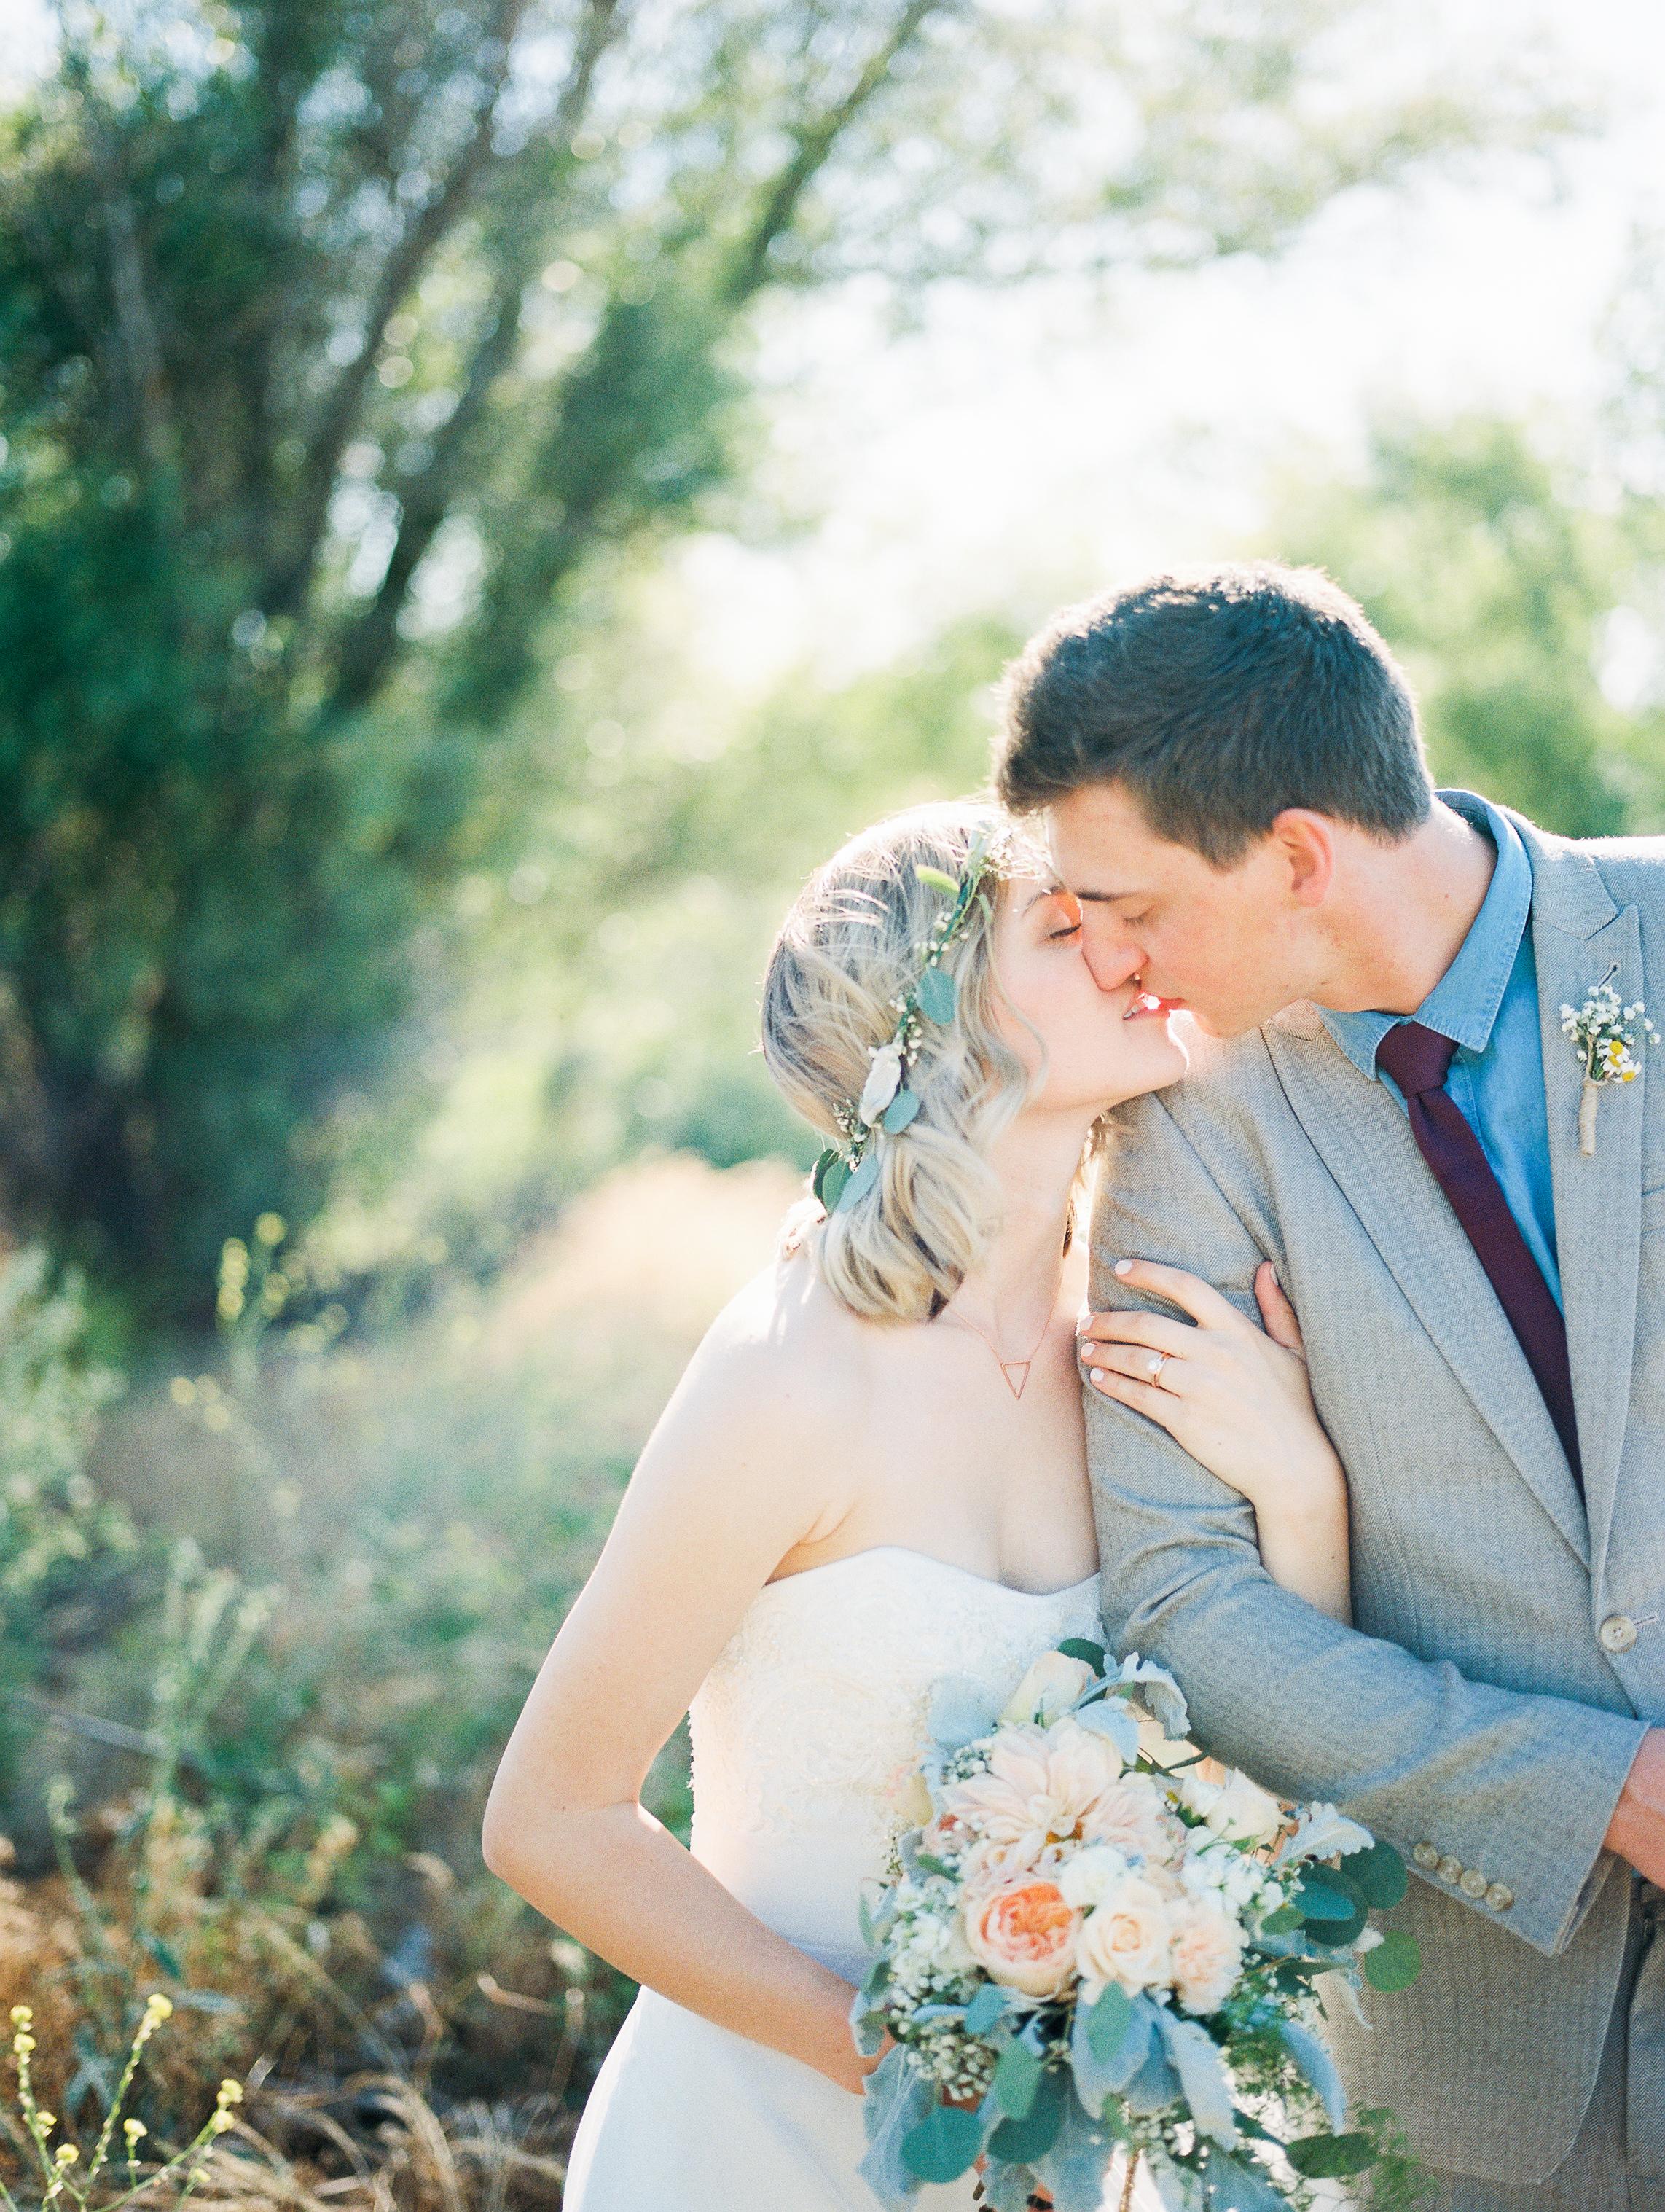 clayton+kennedy-married-filmscans-30.jpg